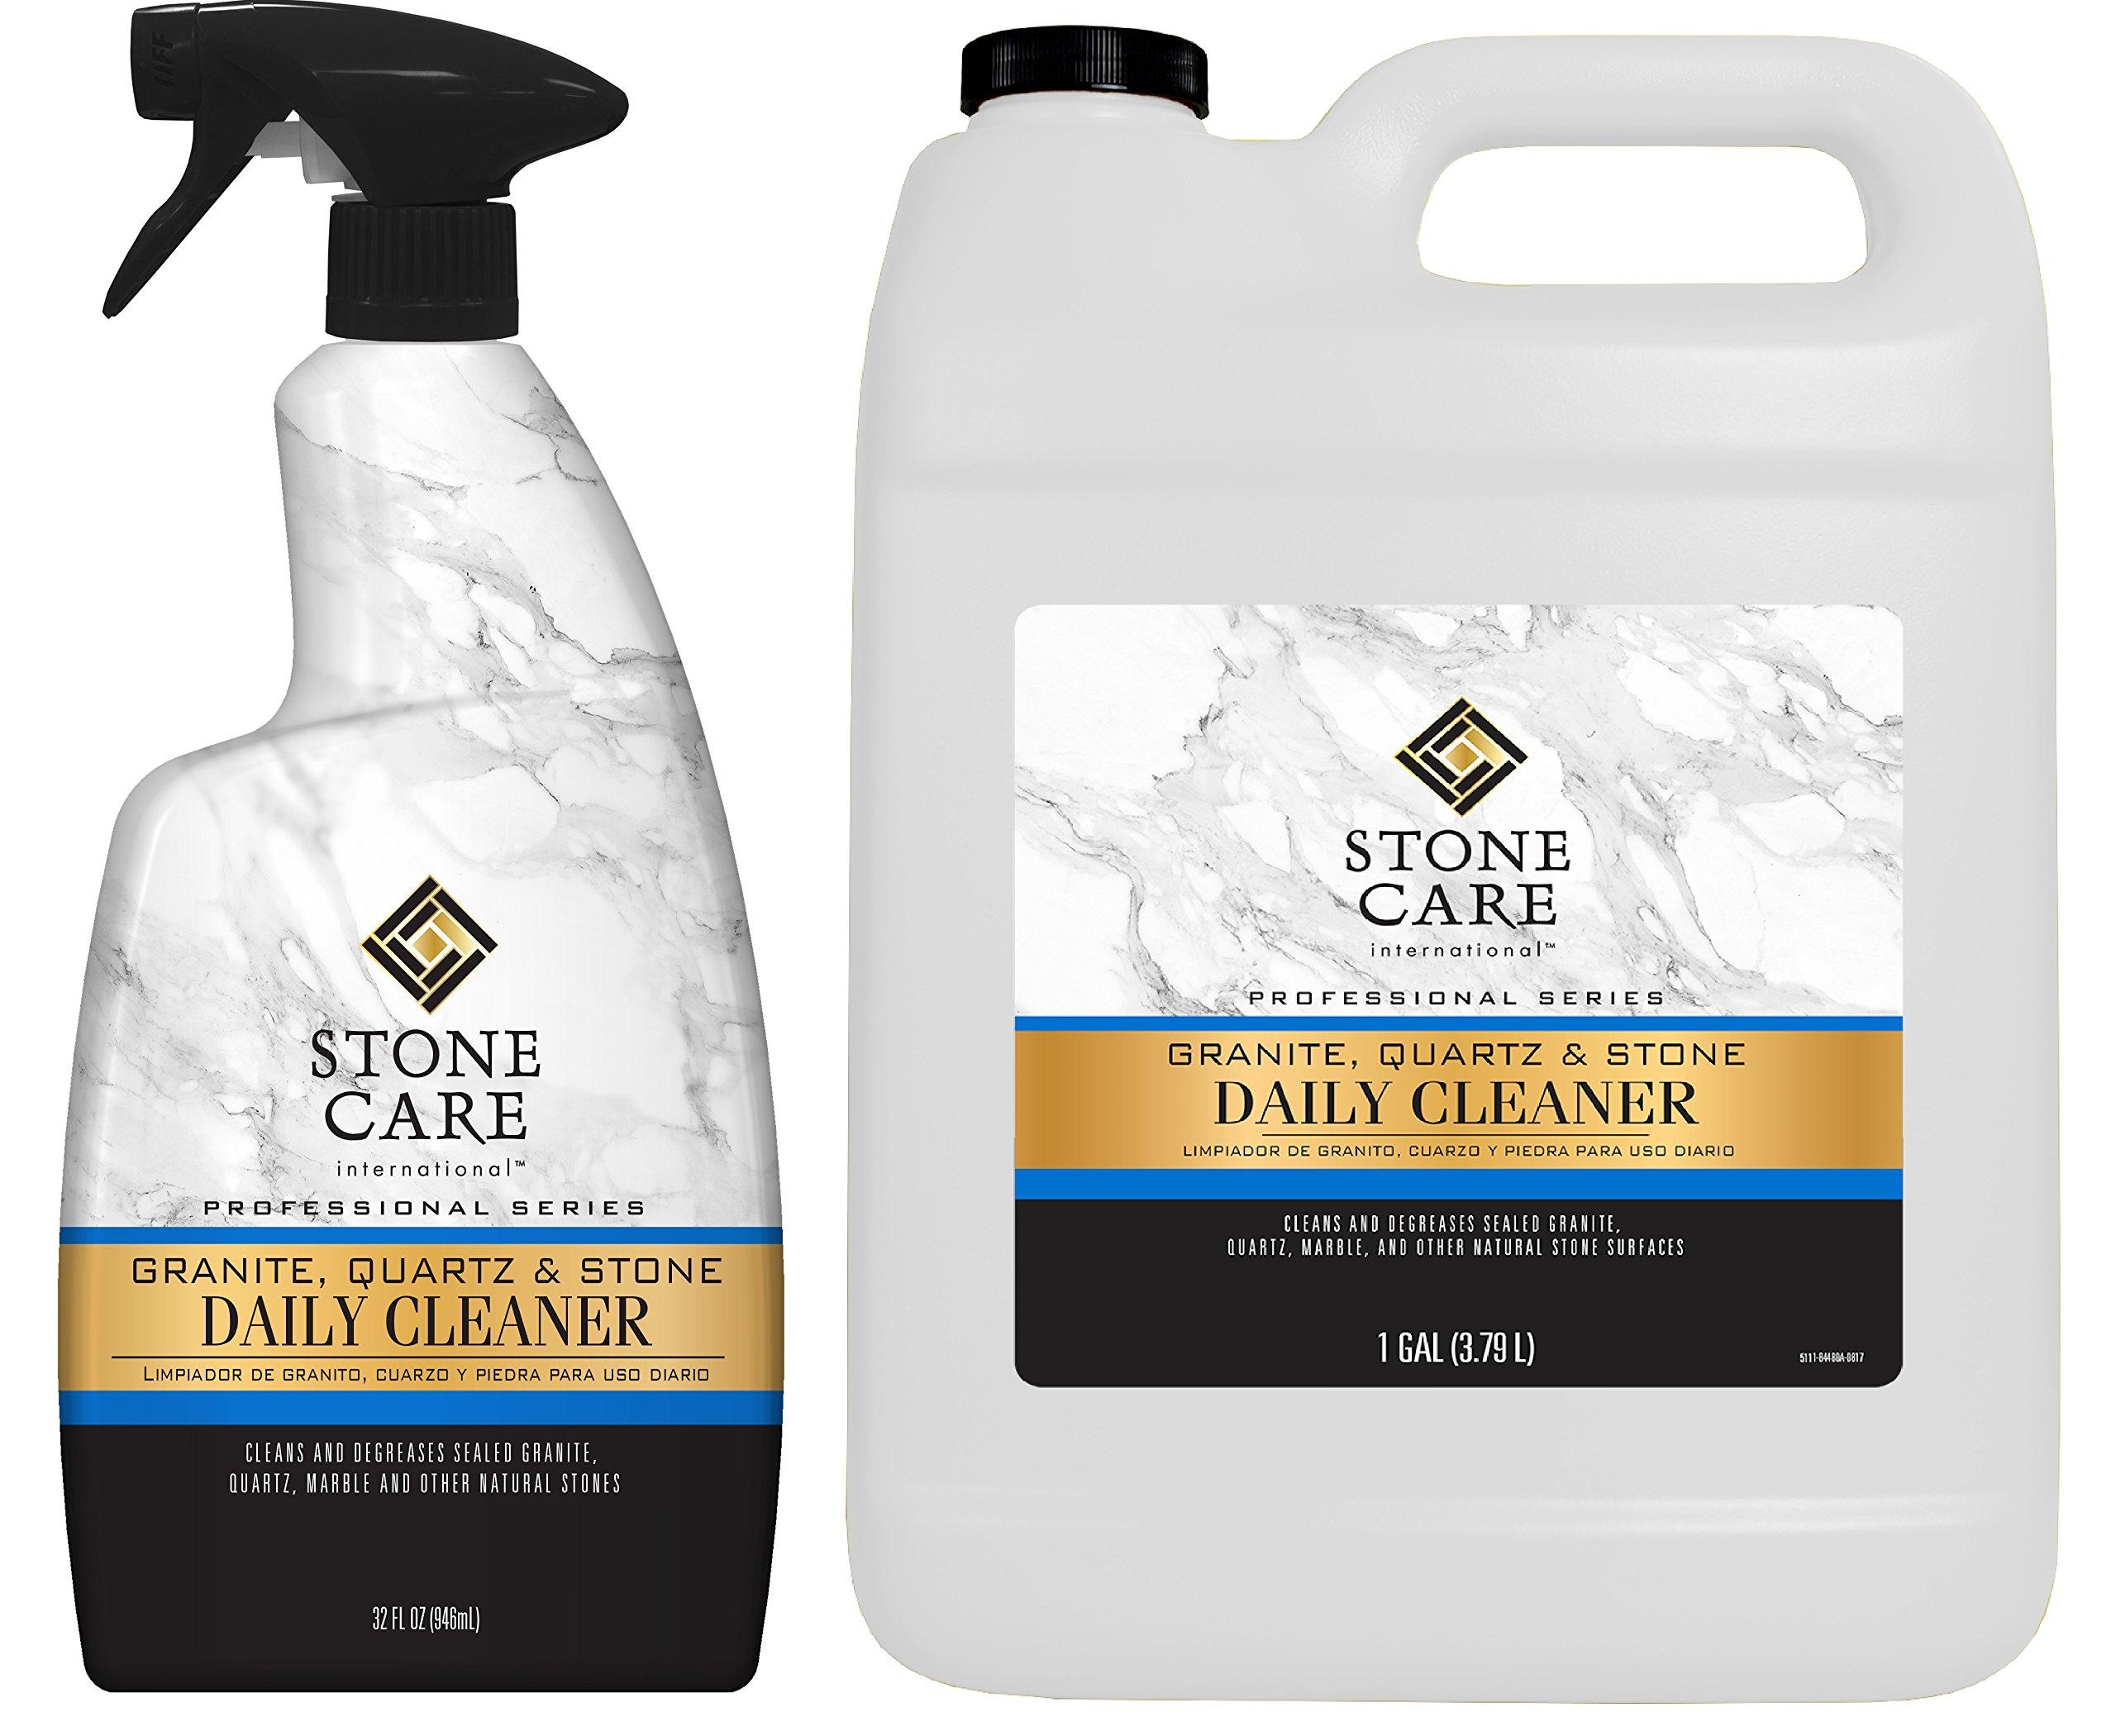 Stone Care International Granite Cleaner - Value Pack - 32 Ounce Trigger and 1 Gallon - Granite Marble Quartz Tile Travertine Limestone Slate Daily Cleaner by Stone Care International